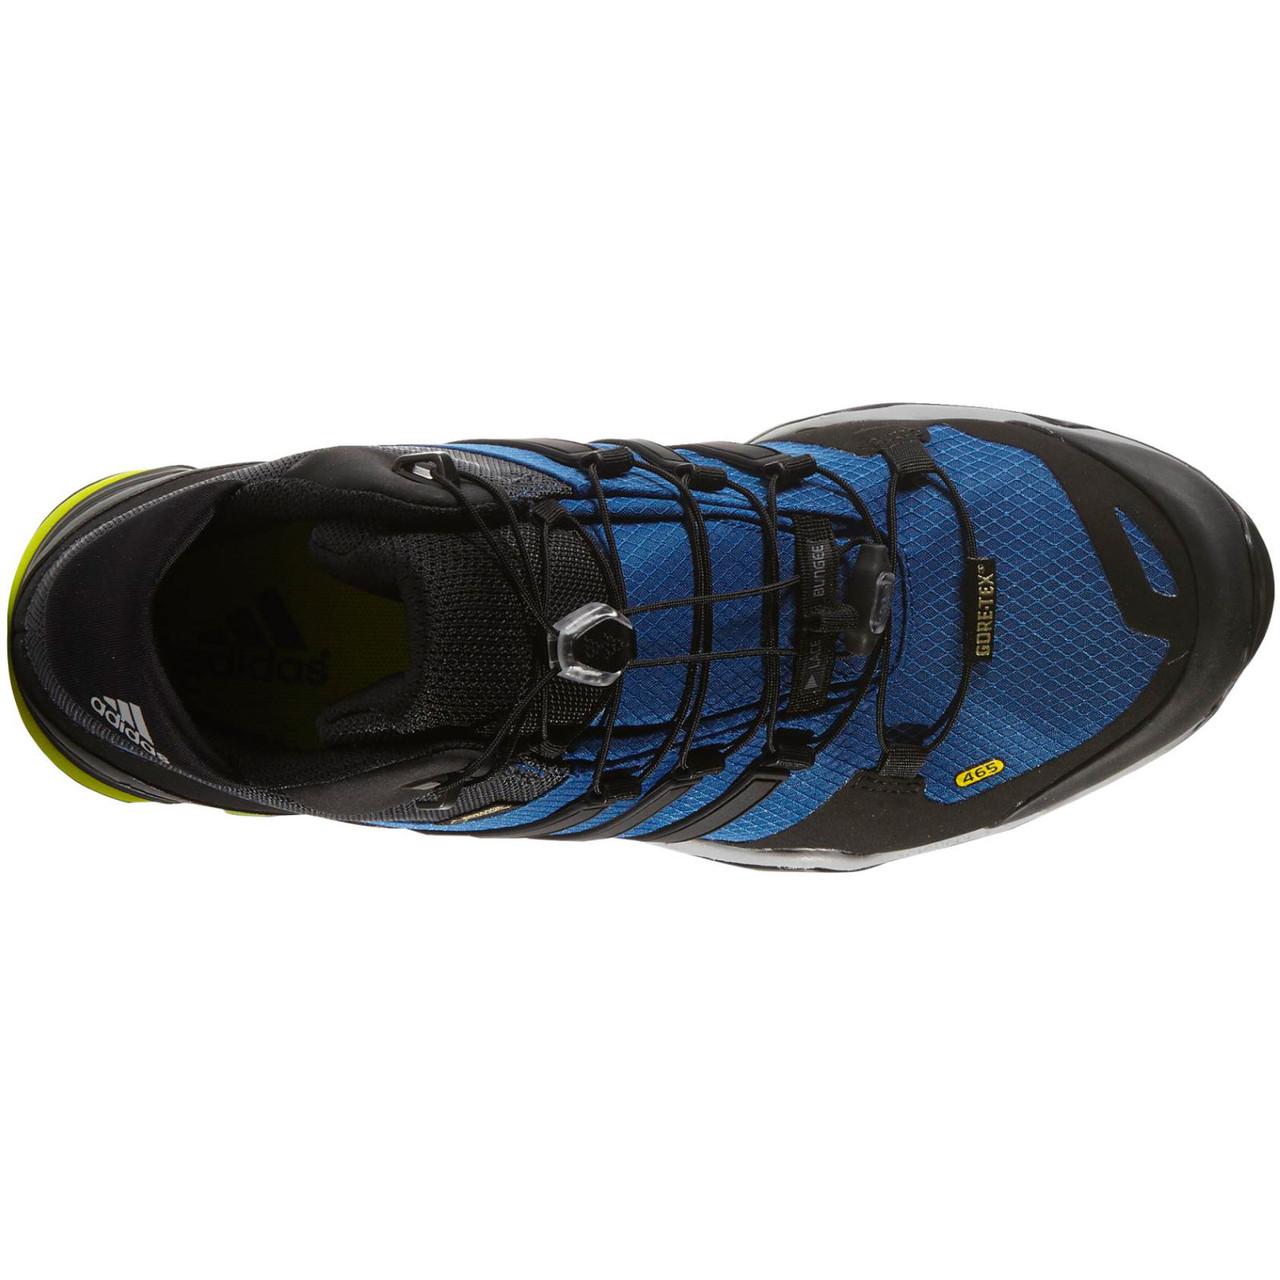 Adidas Terrex Fast R Mid GTX Shoes (SS16) - картинка 3